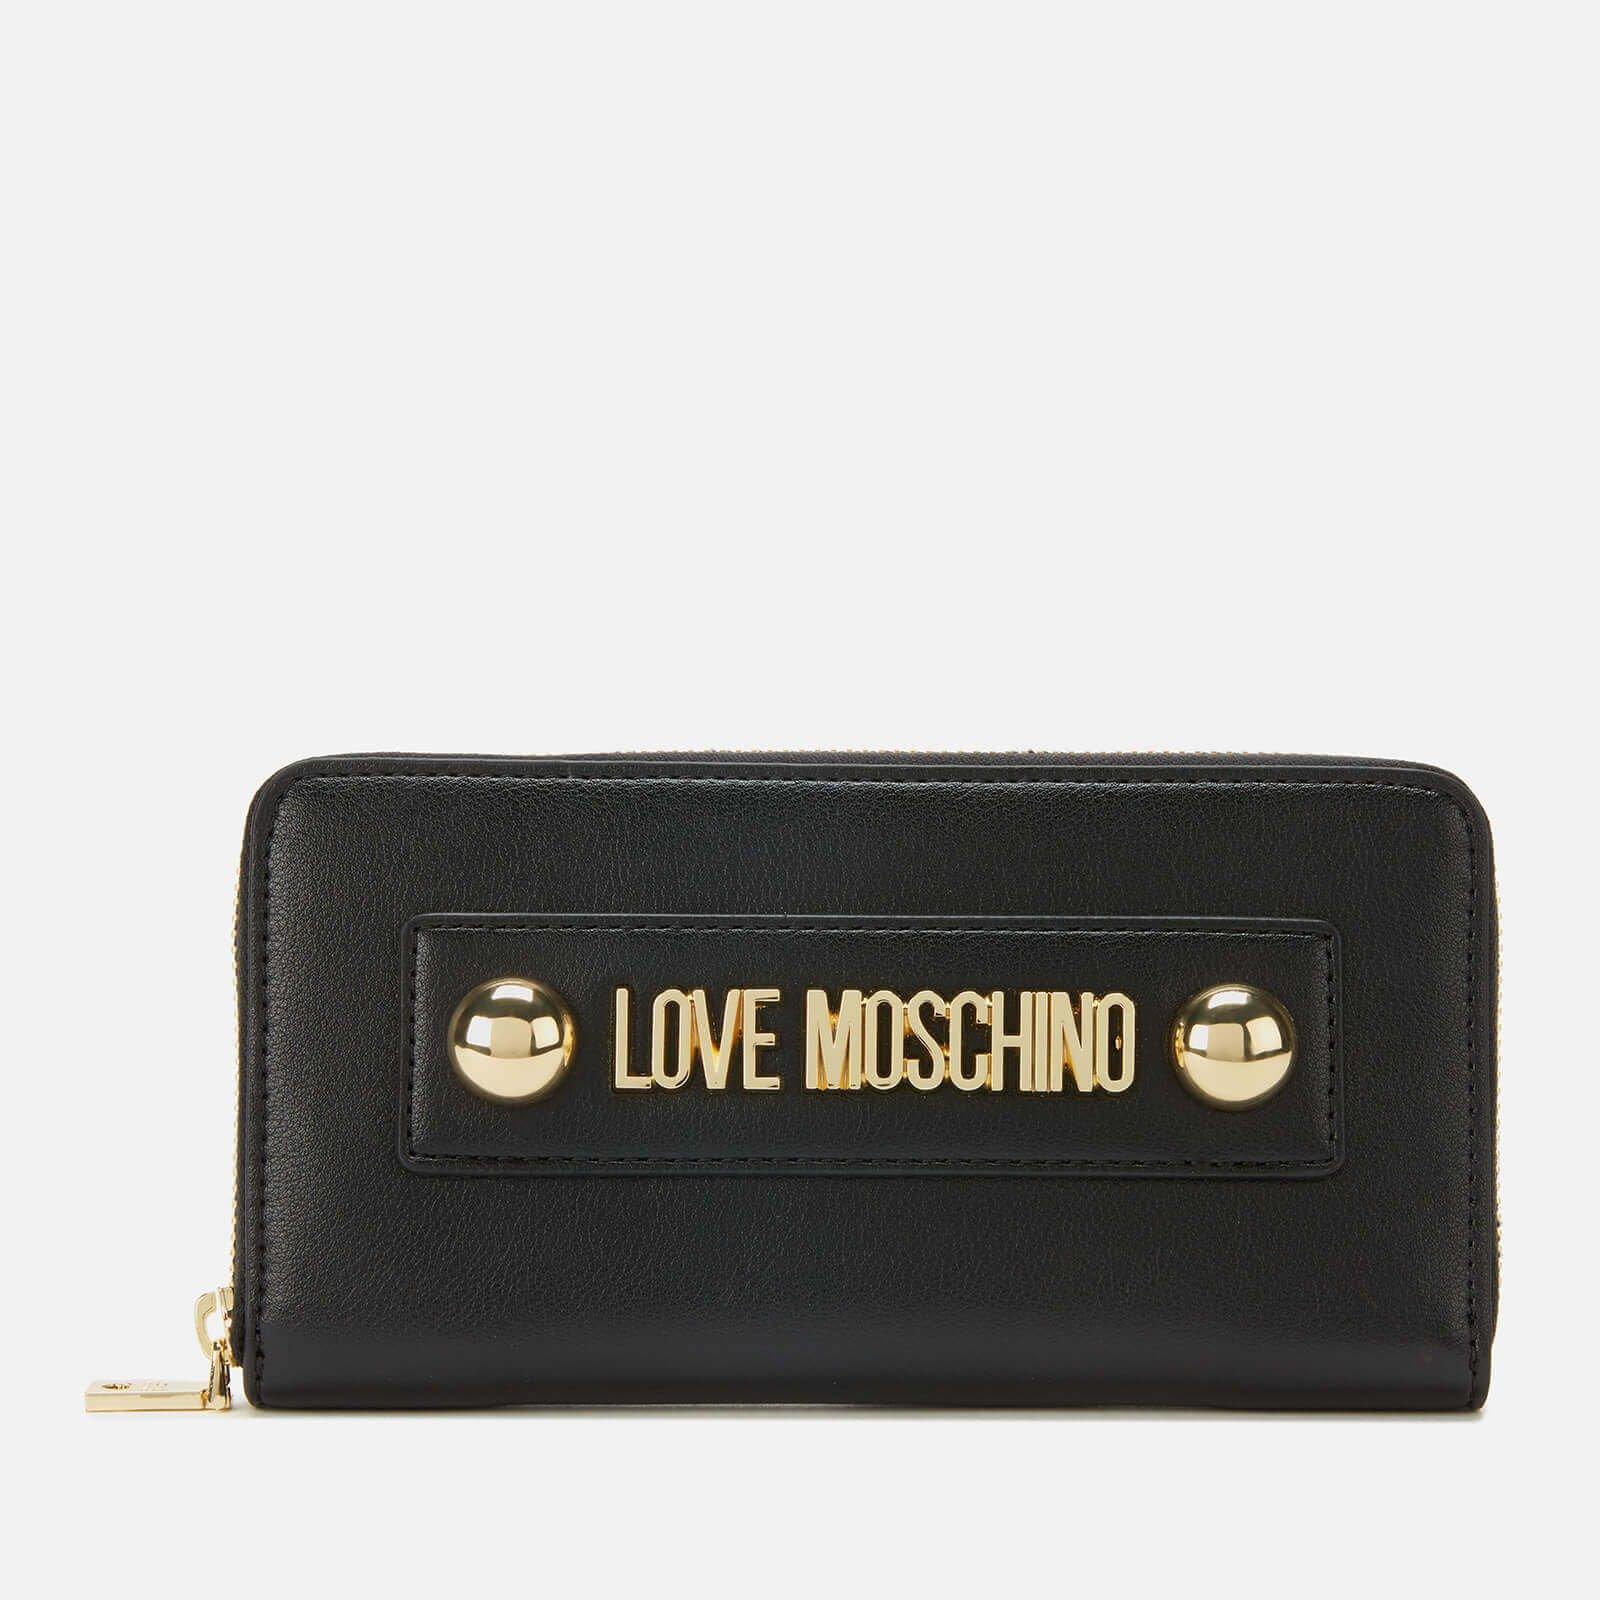 Love Moschino Women's Logo Wallet